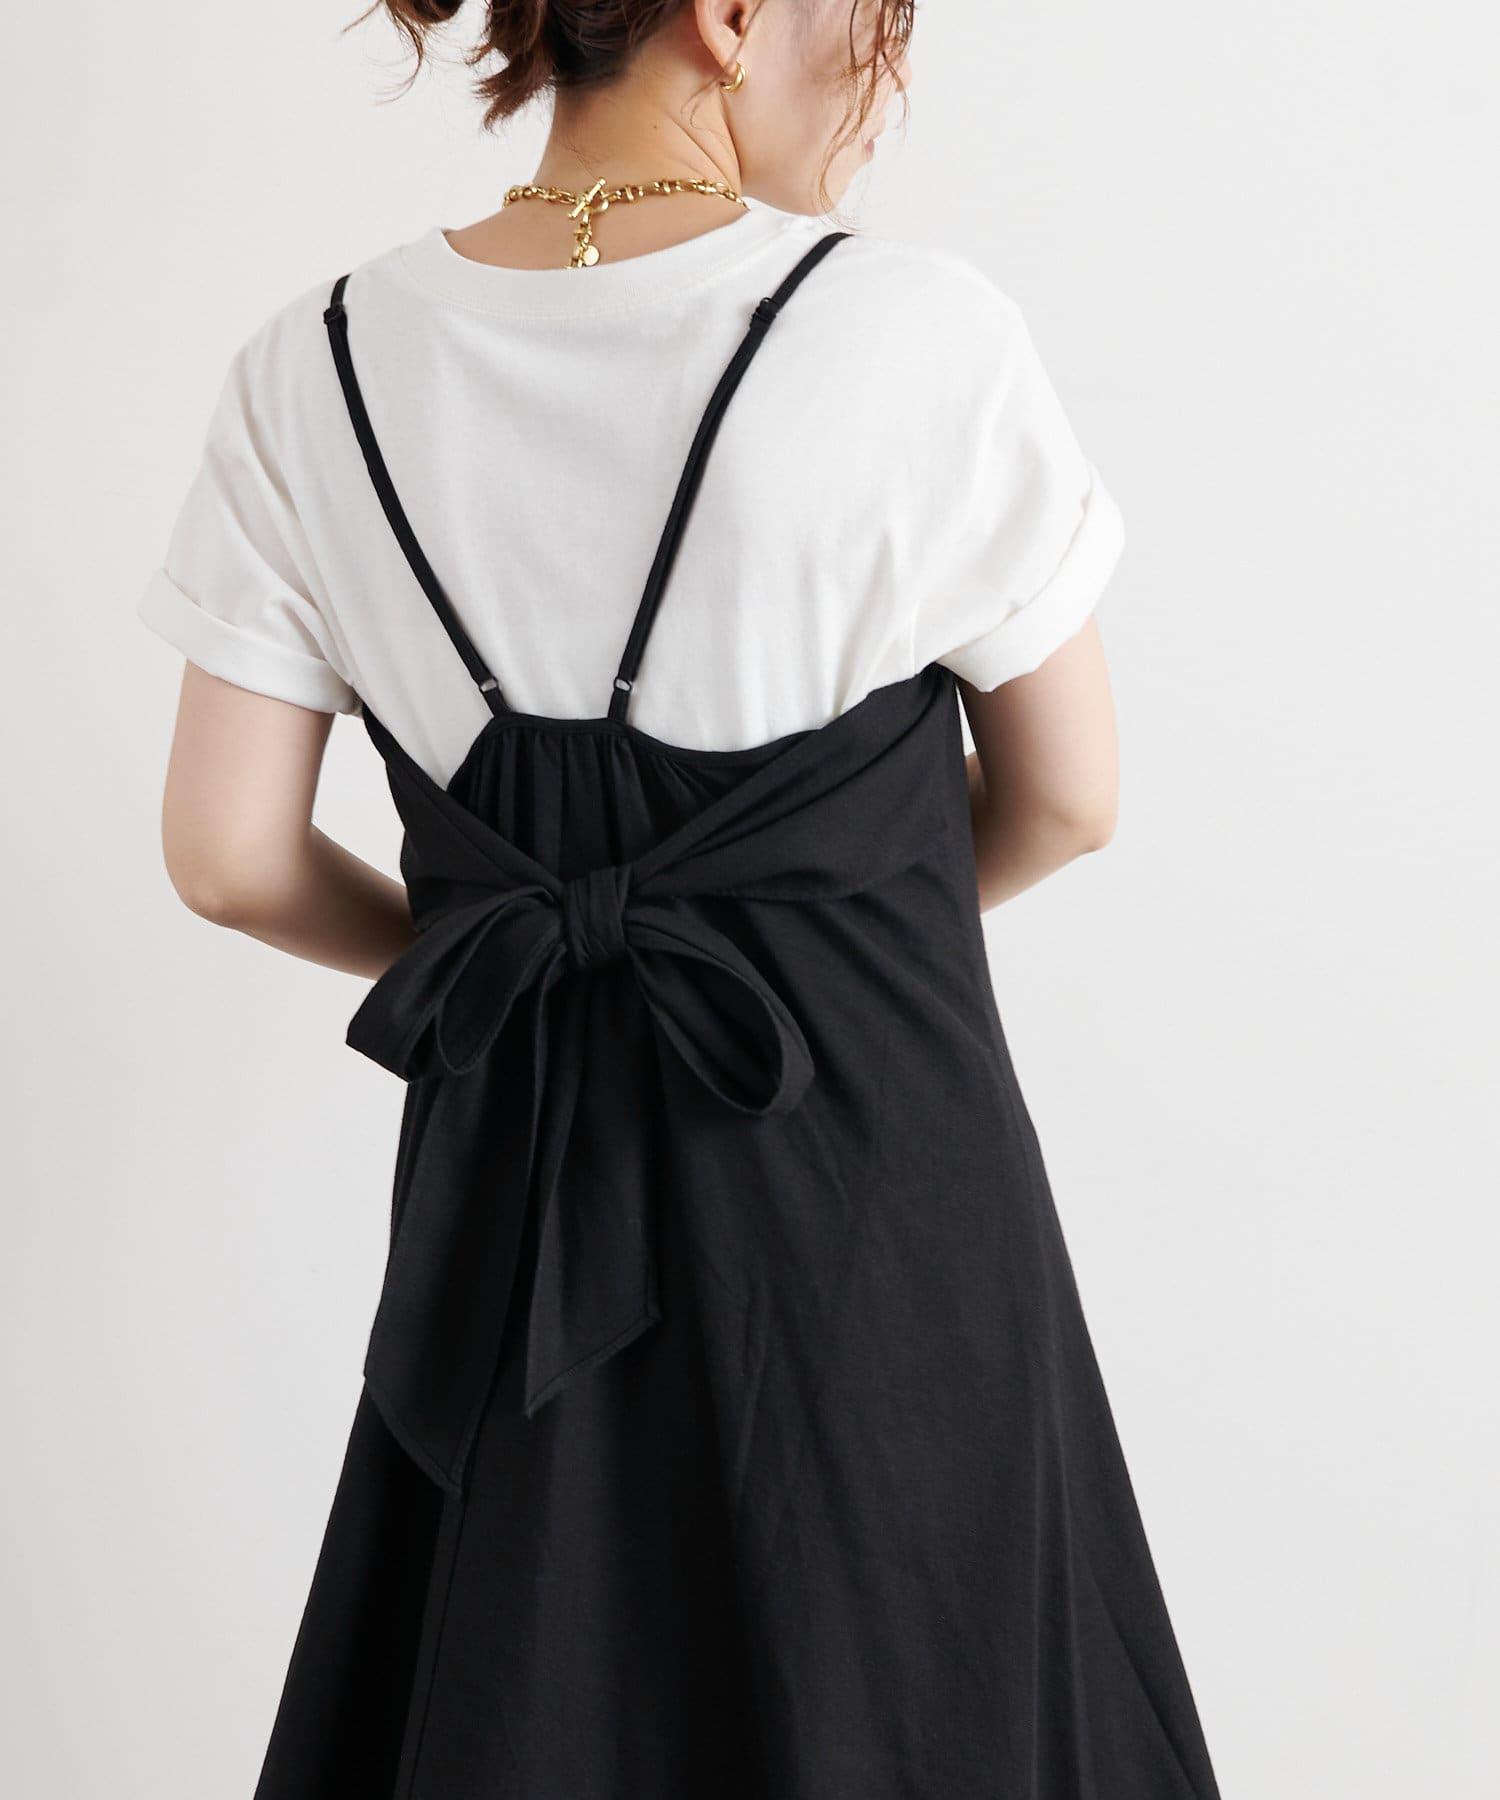 natural couture(ナチュラルクチュール) 【WEB限定】リネン混バックリボン大人ワンピース